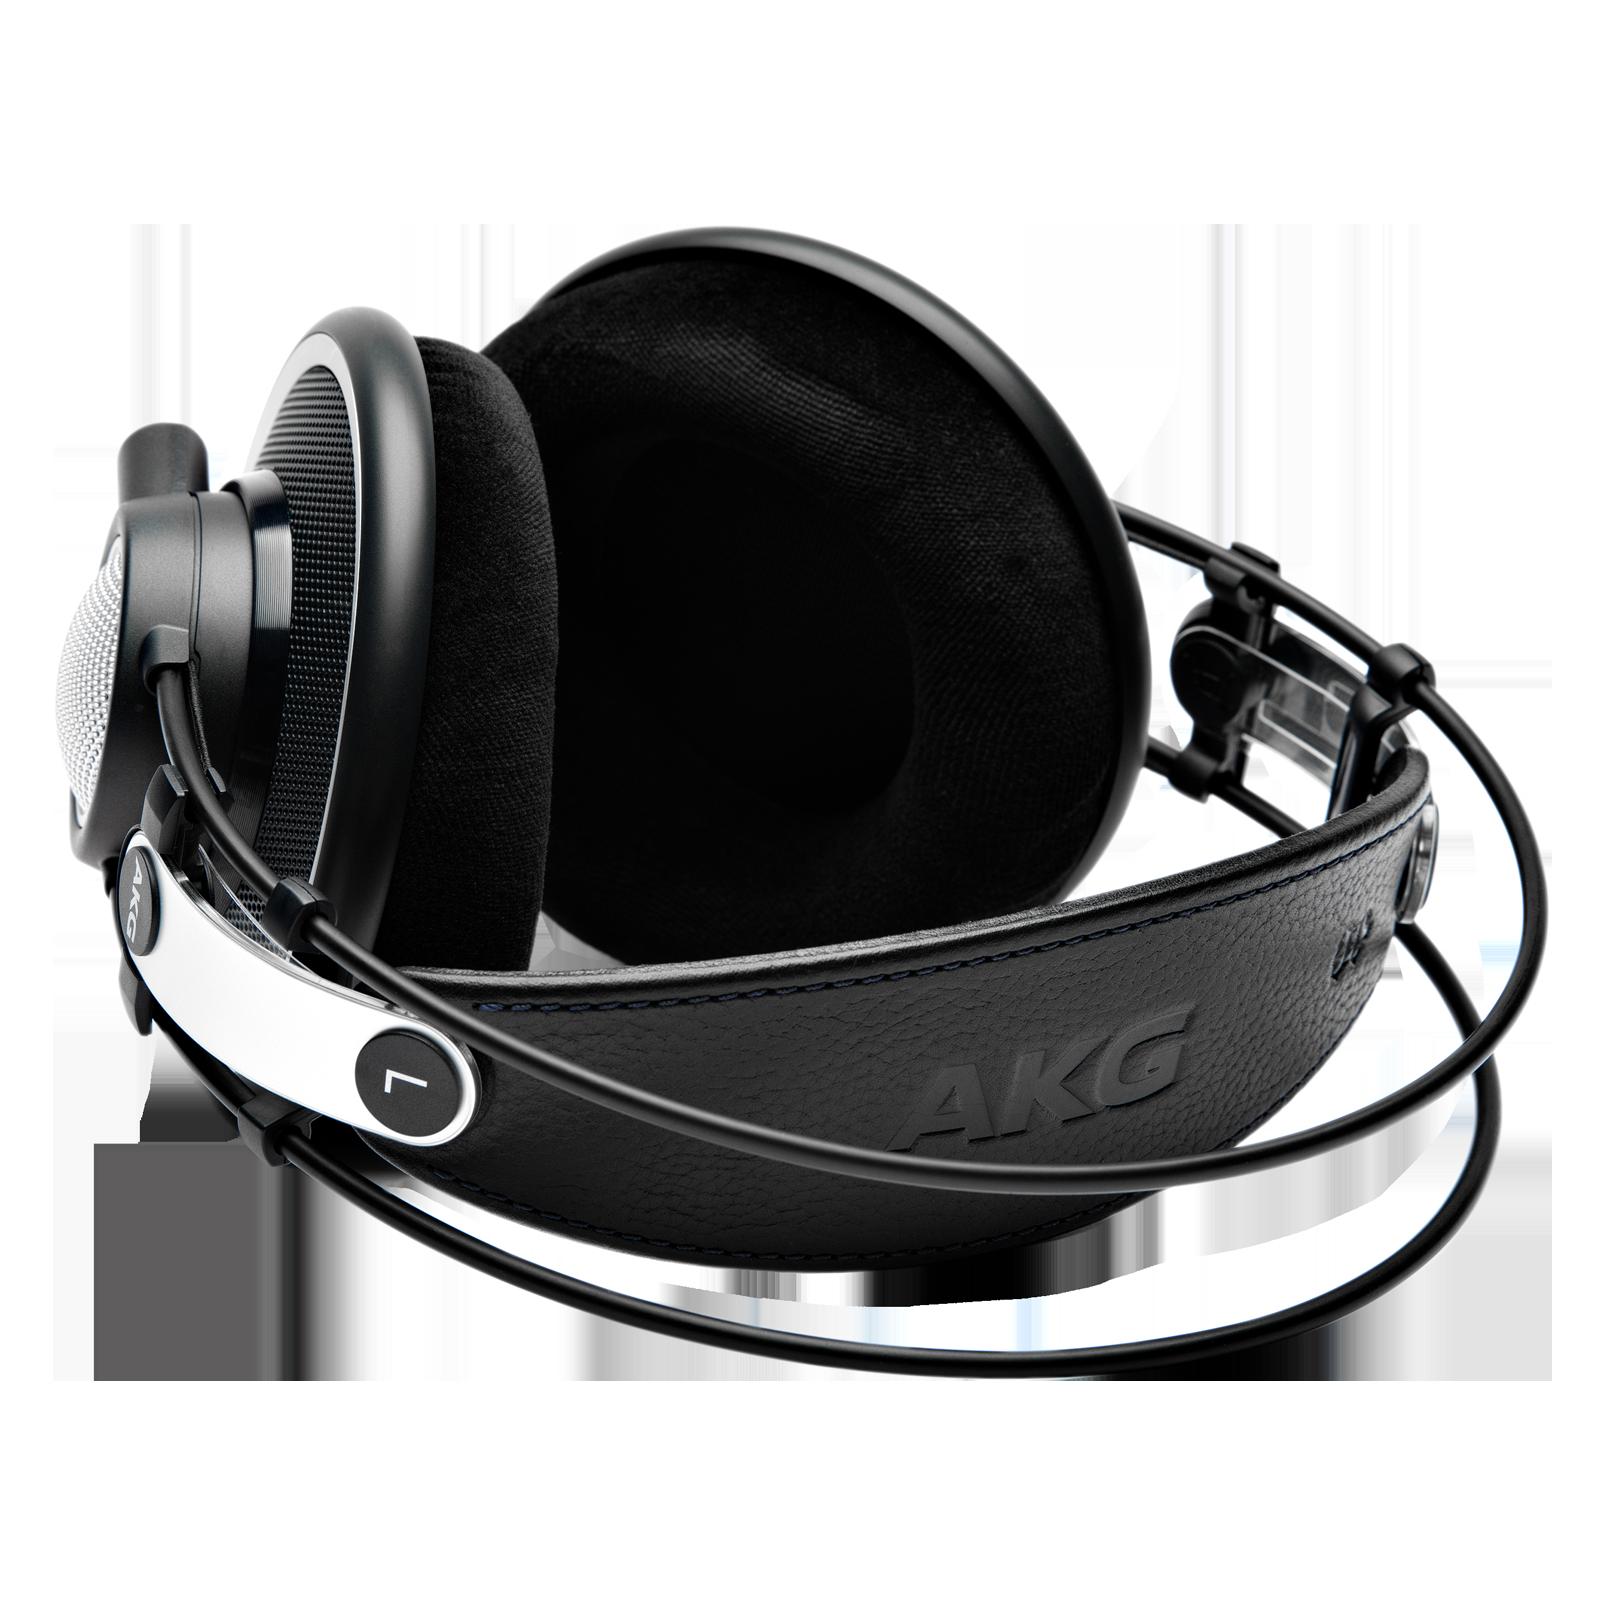 K702 - Black - Reference studio headphones - Detailshot 1